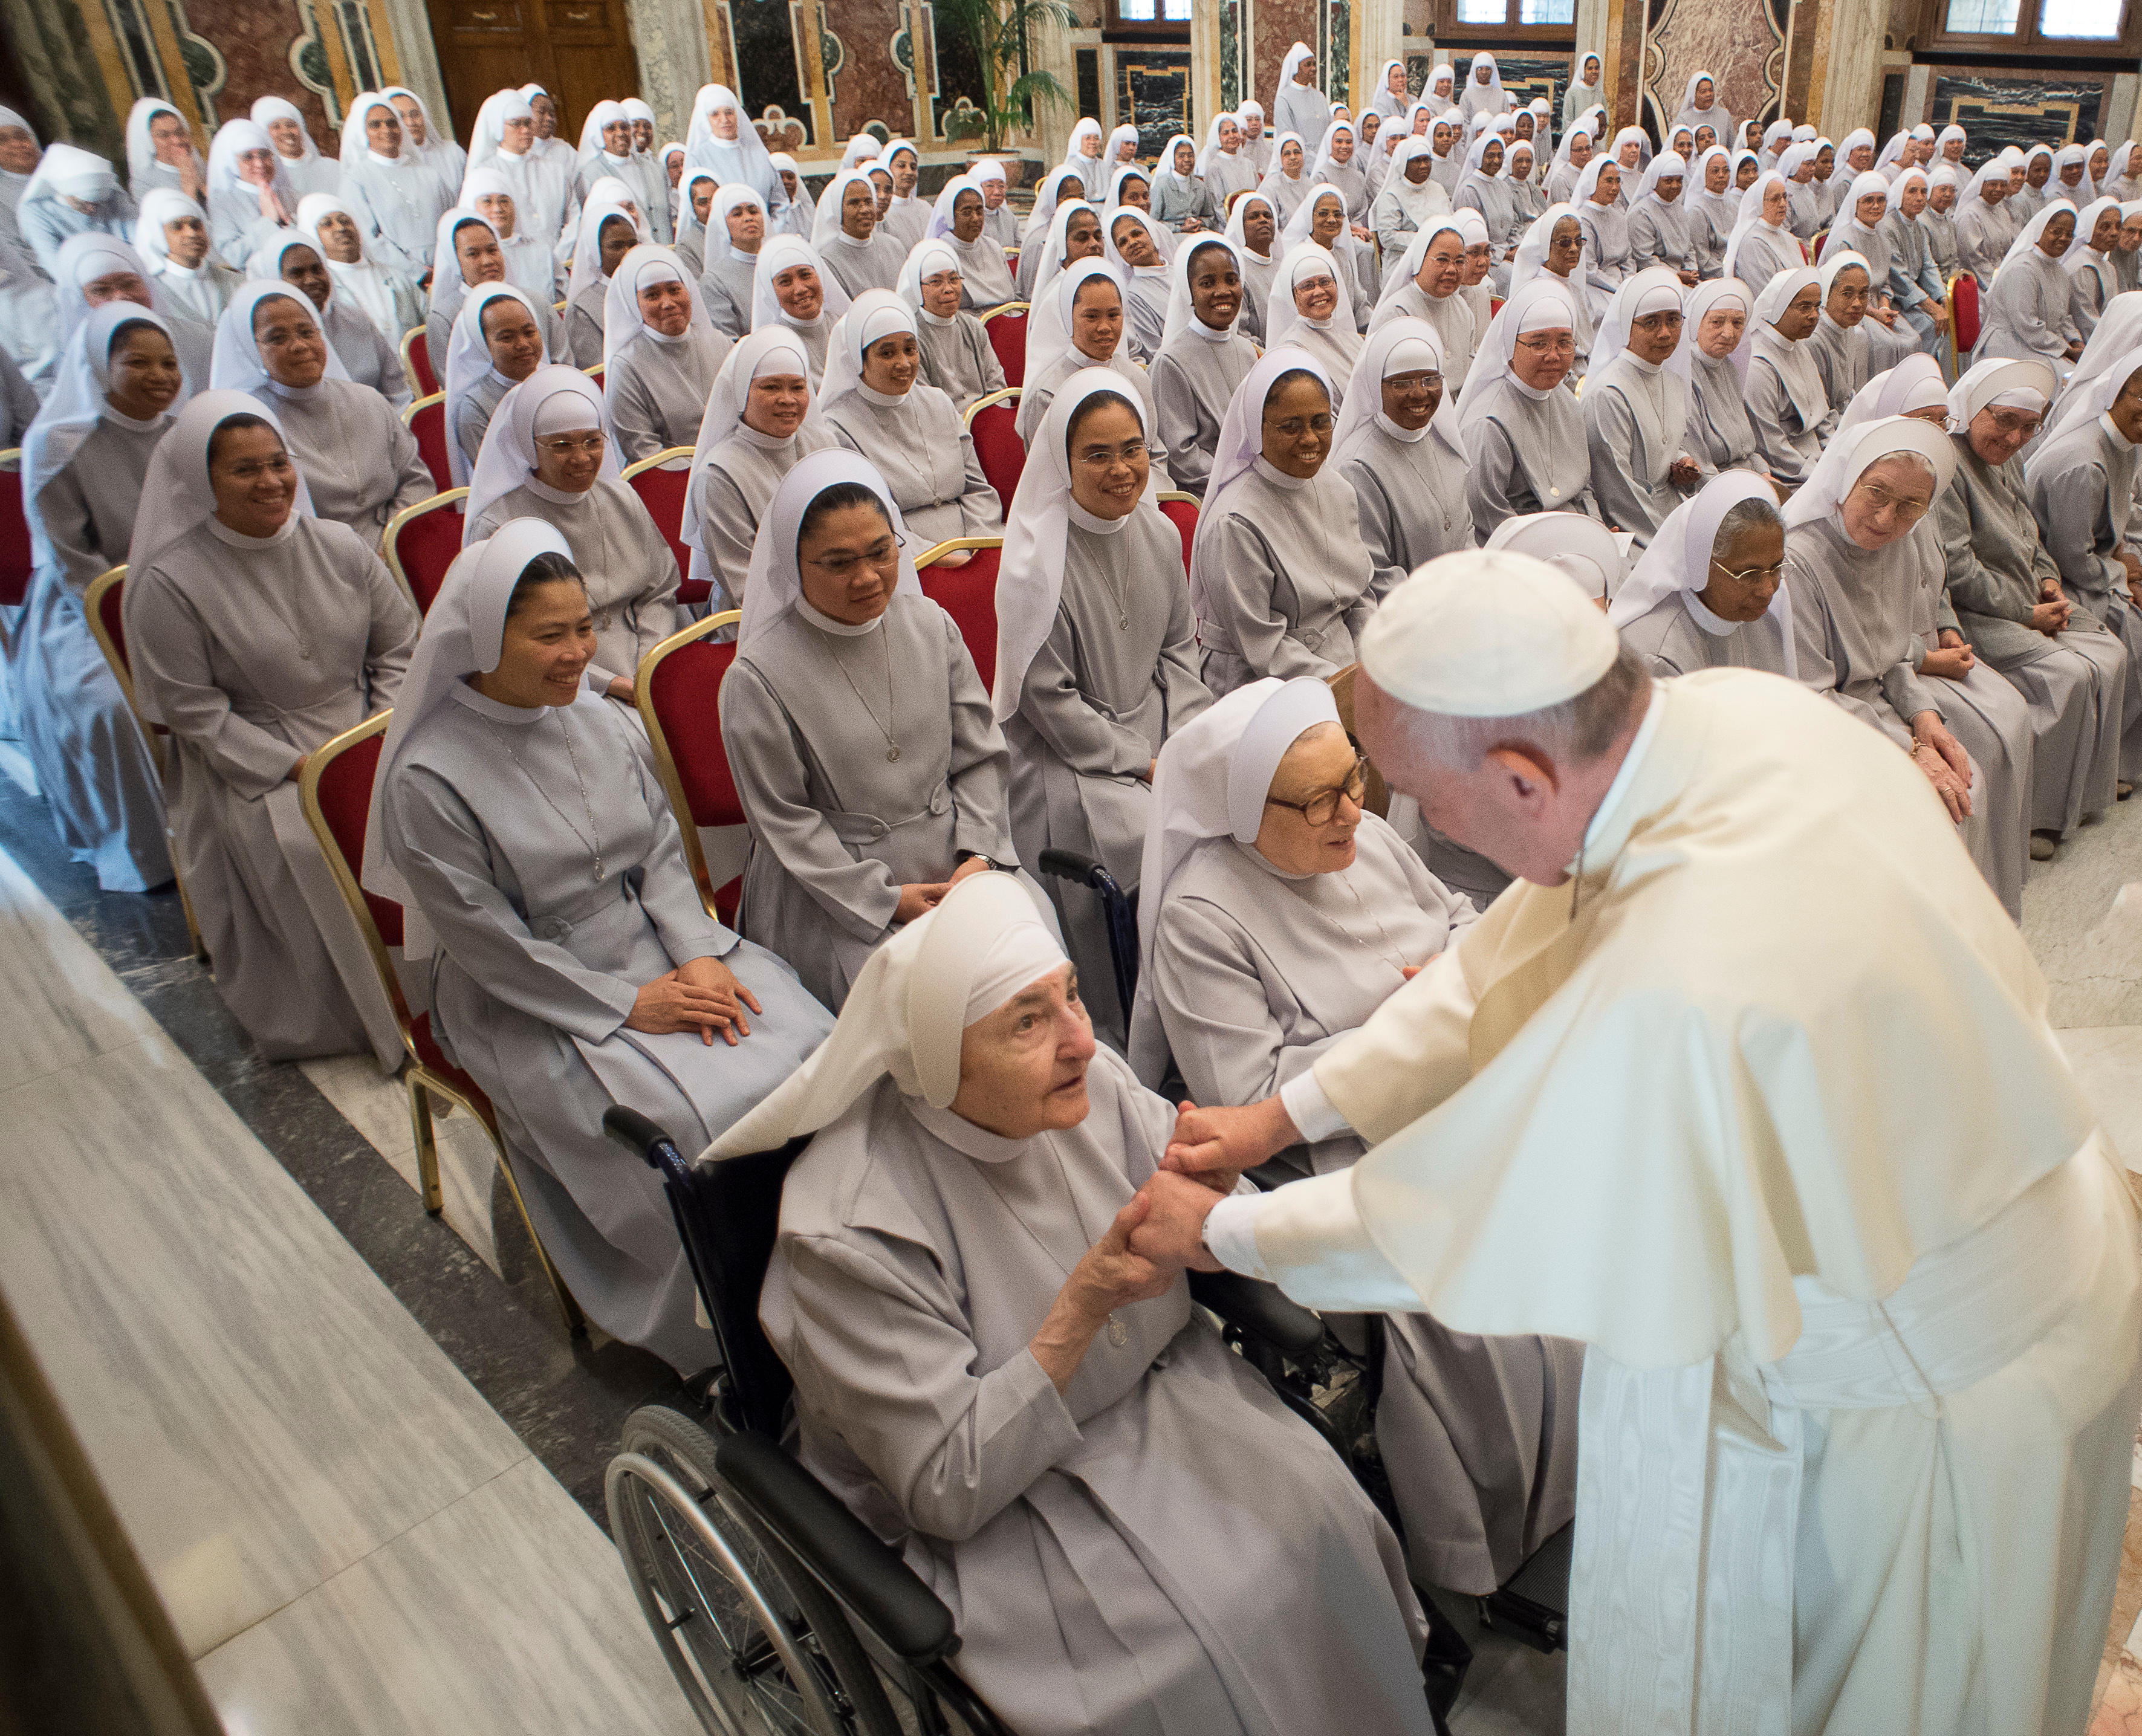 Soeurs de la miséricorde, 24 sept. 2016 © L'Osservatore Romano